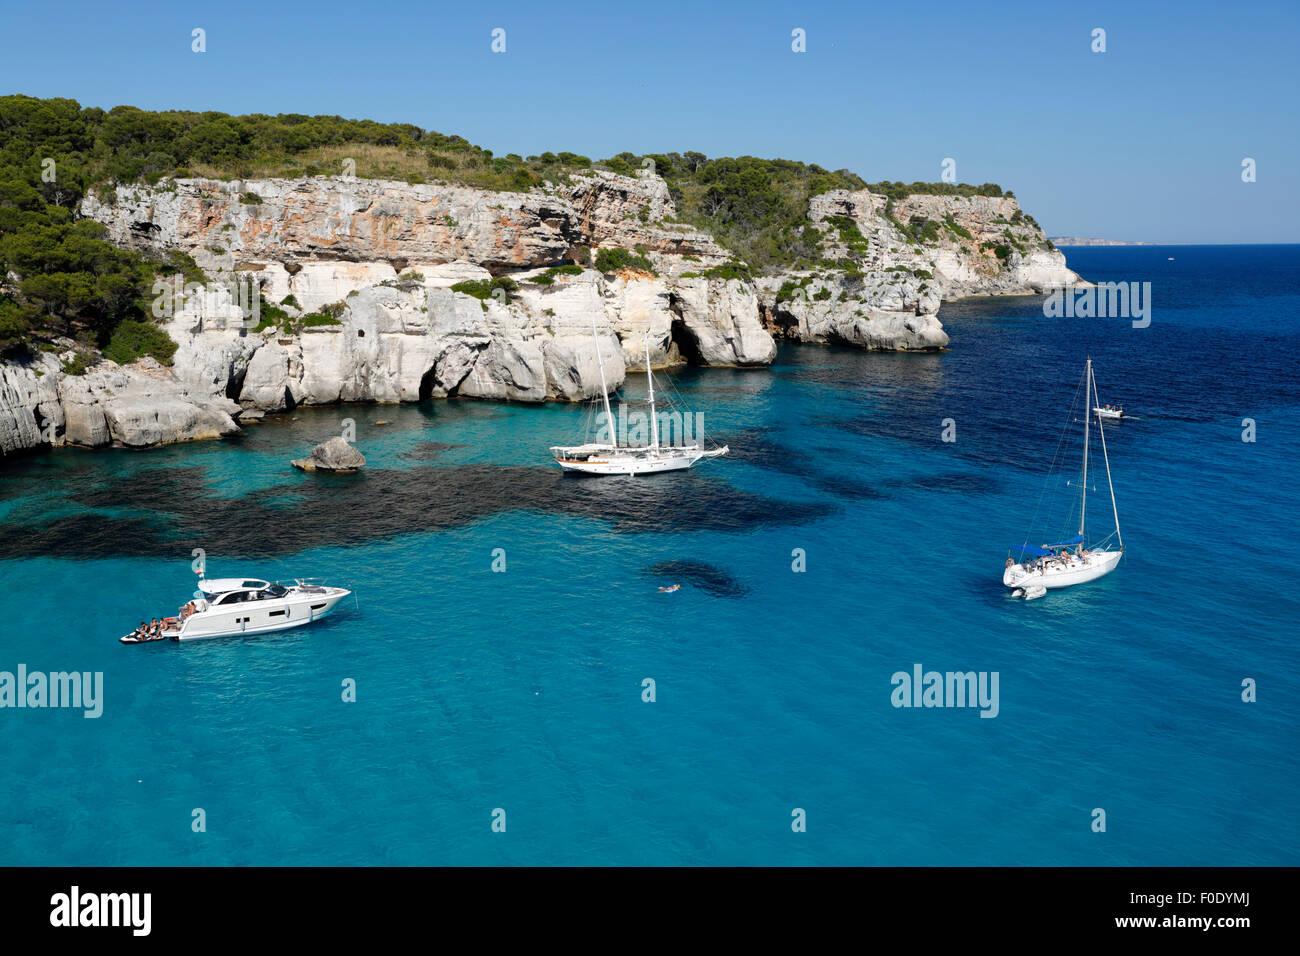 Yachts anchored in cove, Cala Macarella, near Cala Galdana, South West Coast, Menorca, Balearic Islands, Spain, - Stock Image